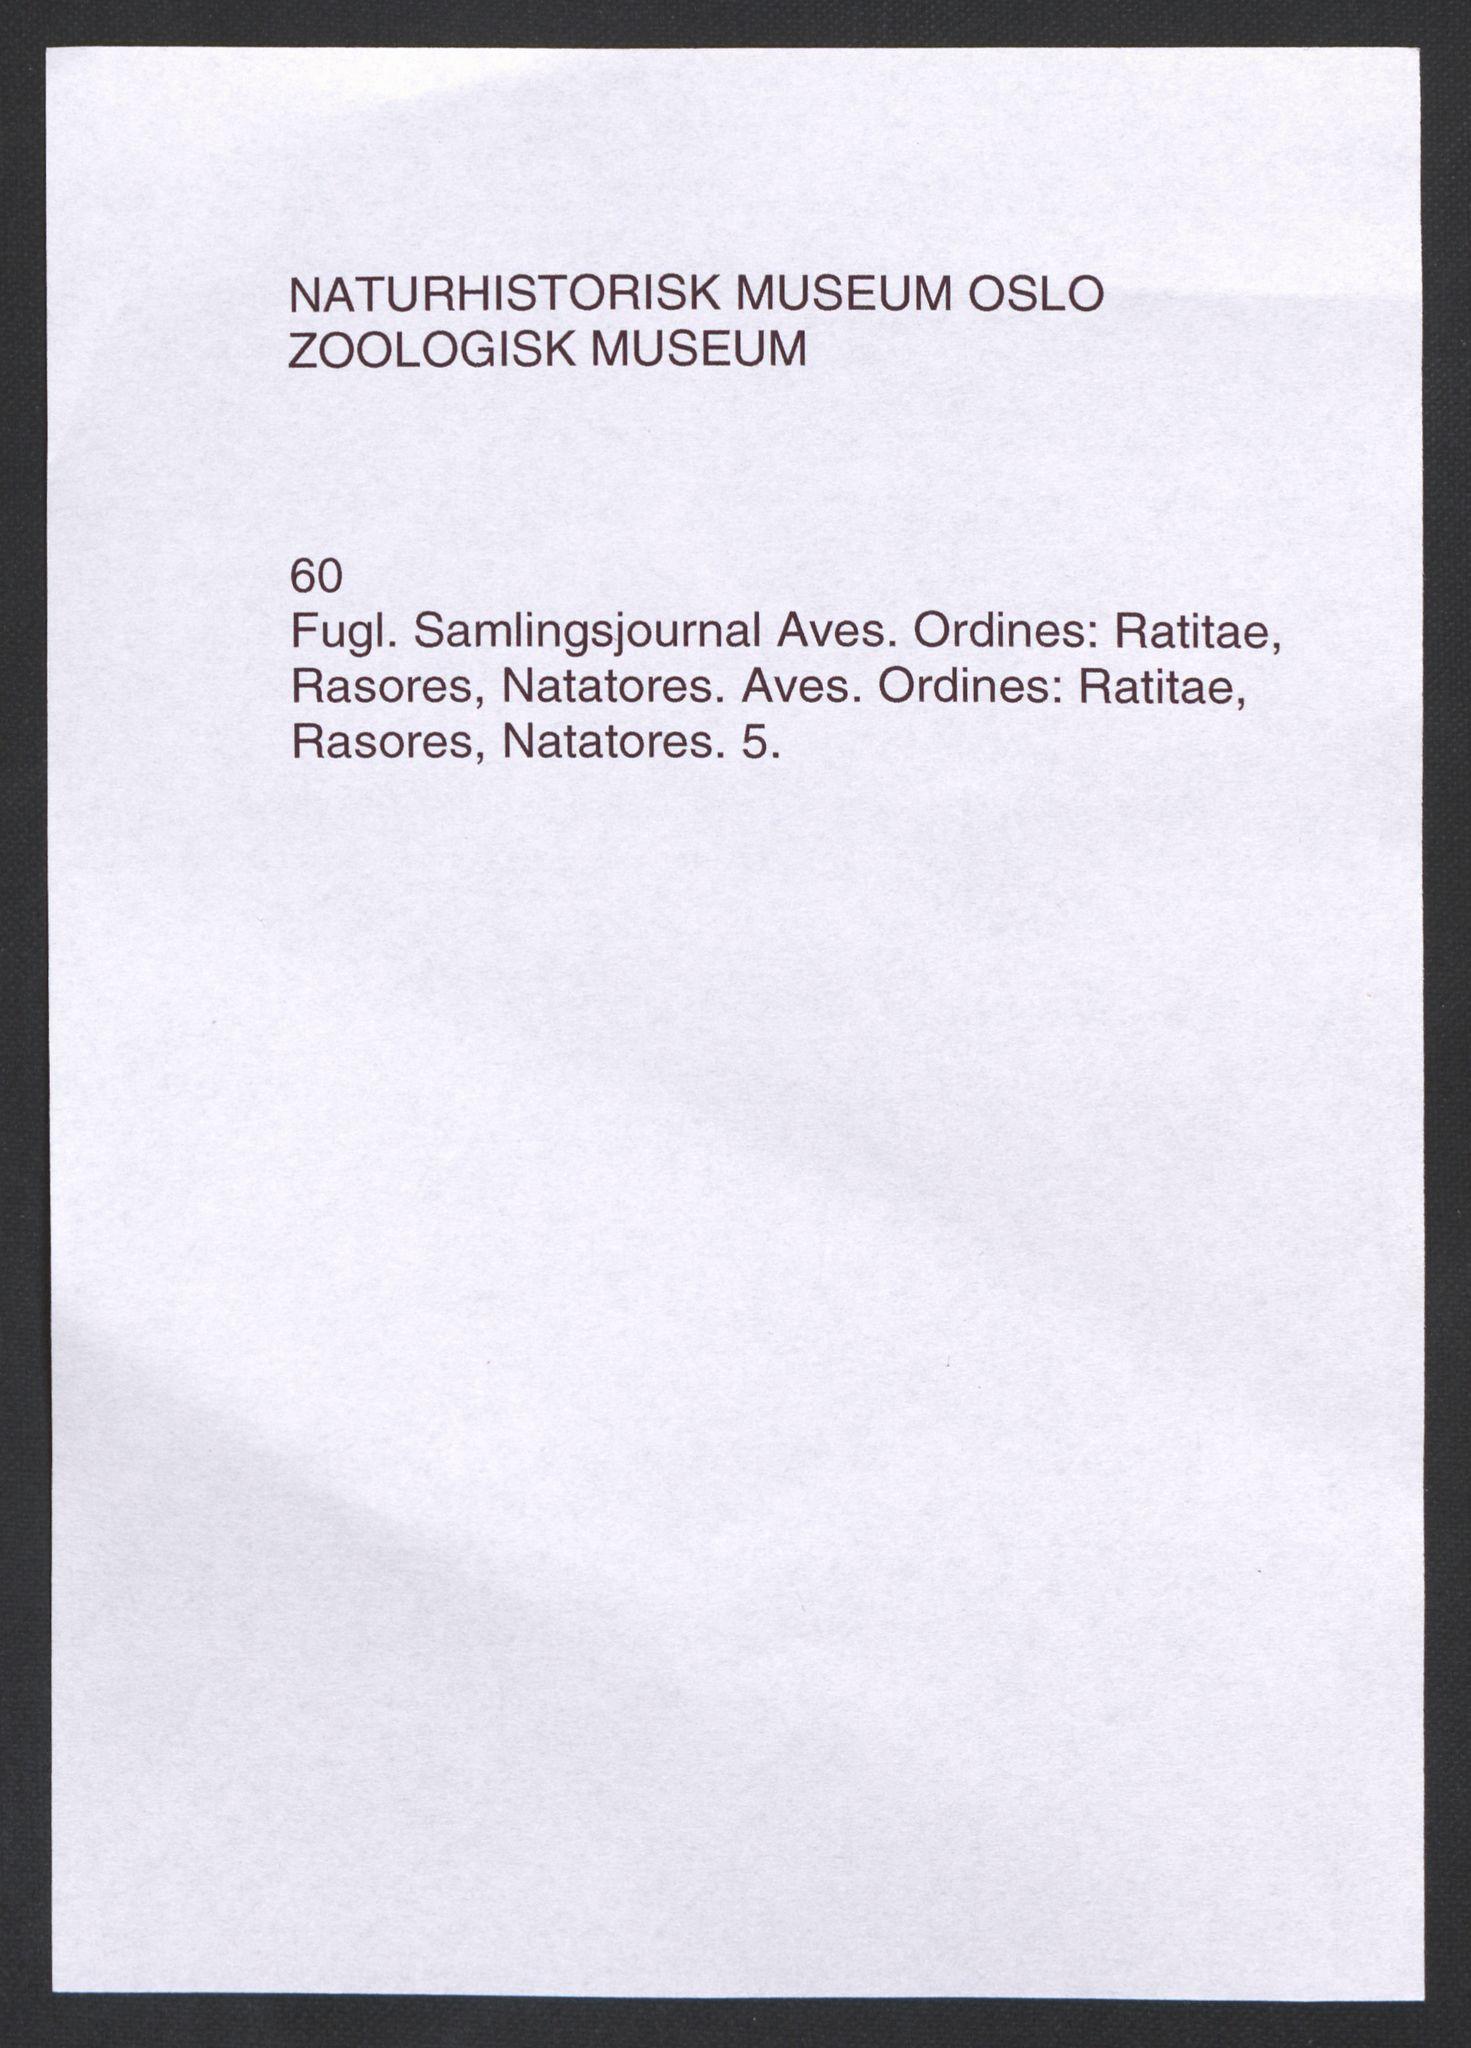 NHMO, Naturhistorisk museum (Oslo), 2: Fugl. Taksonomisk journal. Aves. Ordines: Ratitae, Rasores, Natatores